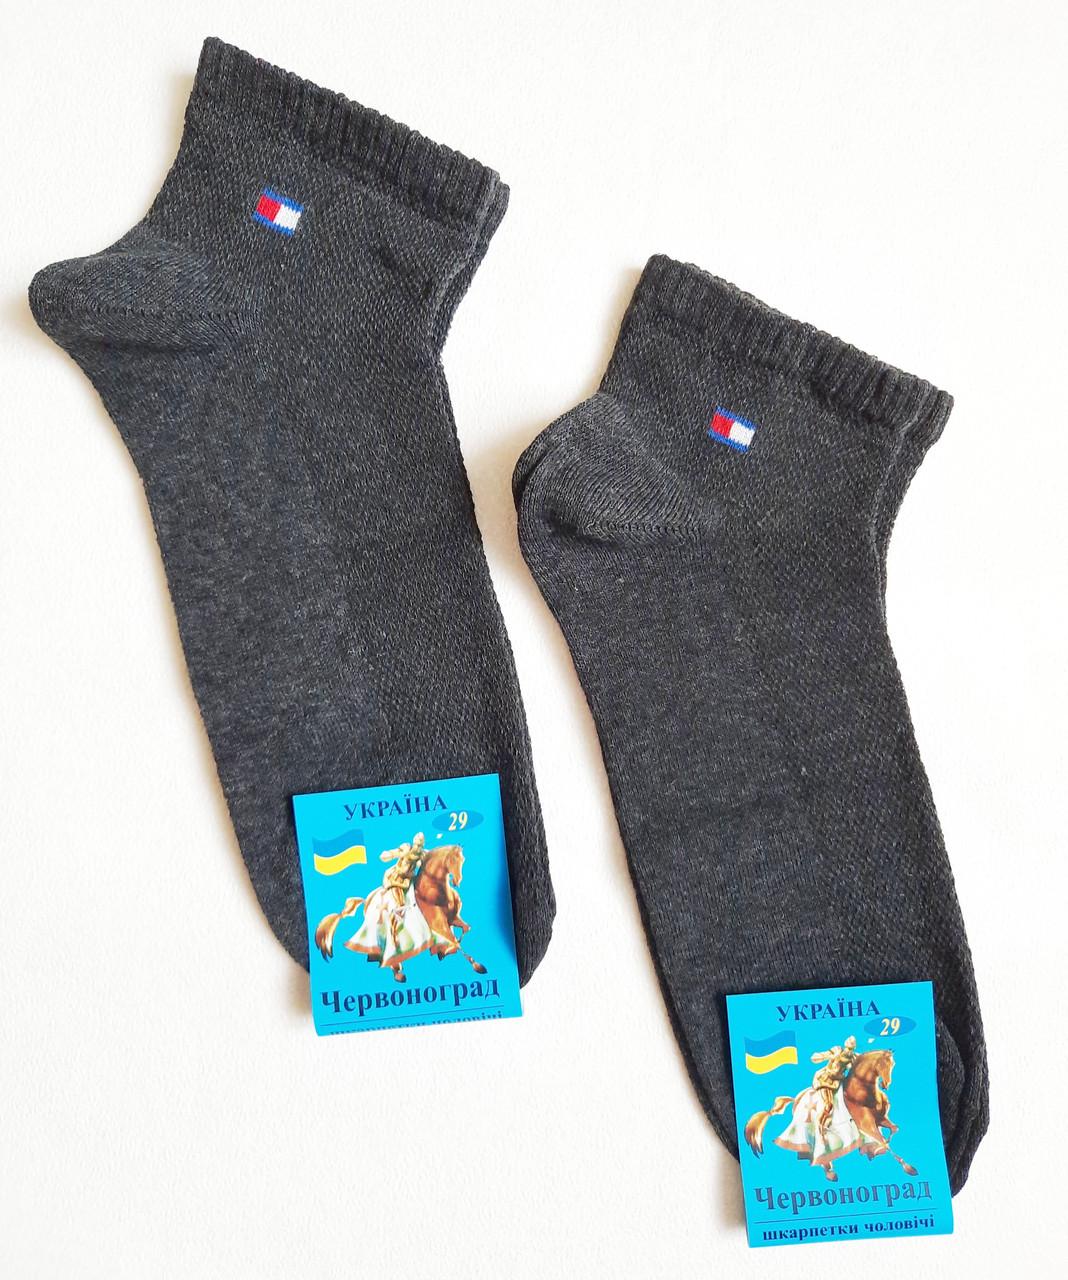 Носки мужские вставка сеточка р.29 тёмно-серые хлопок стрейч Украина. От 10 пар по 6,50грн.